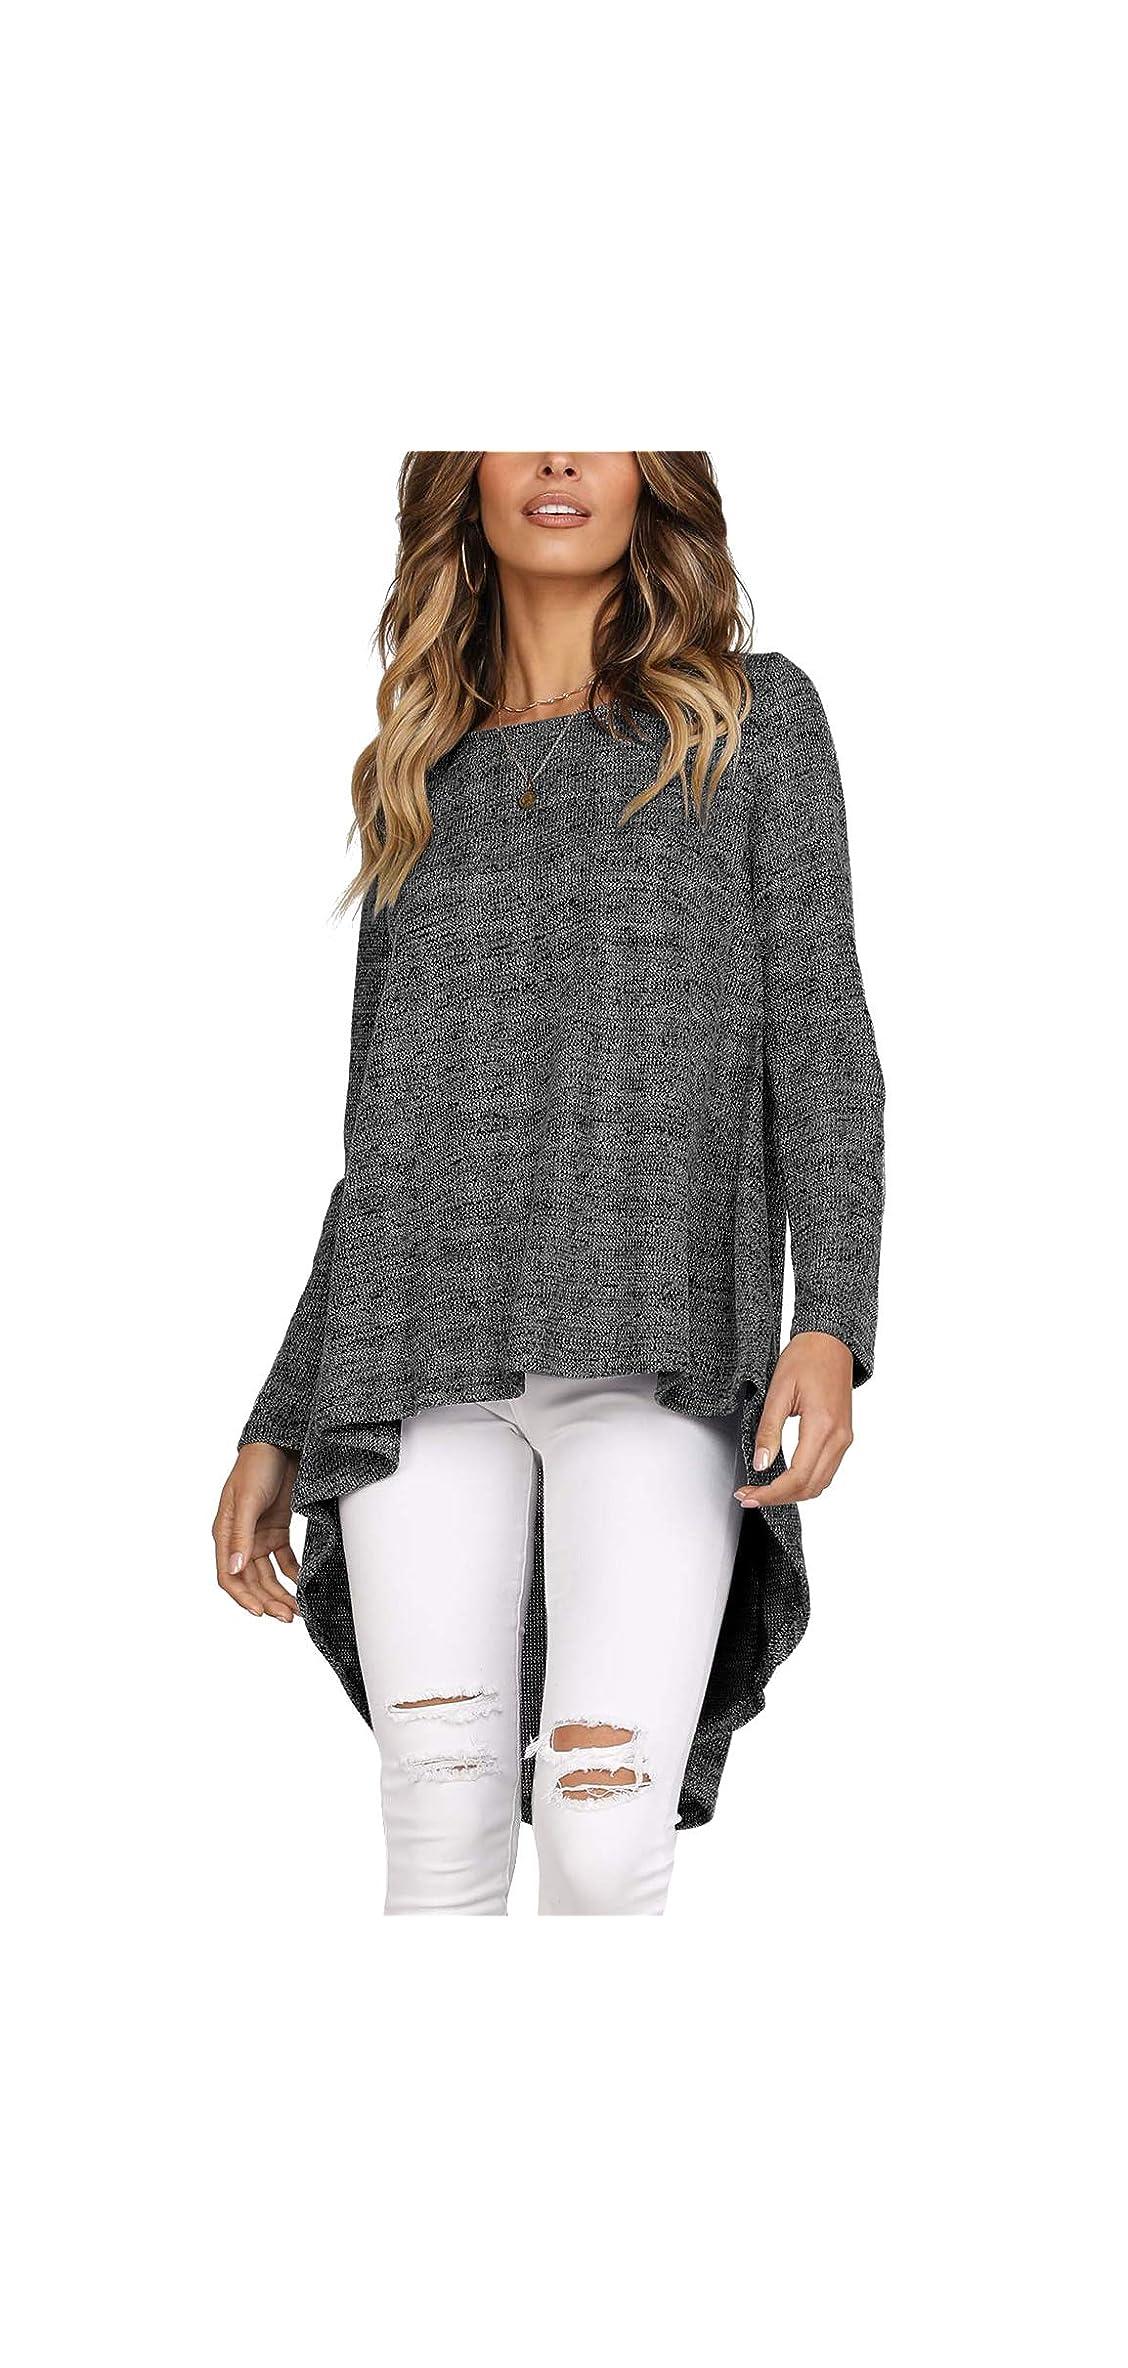 Womens Sweater Long Sleeve Asymmetrical High Low